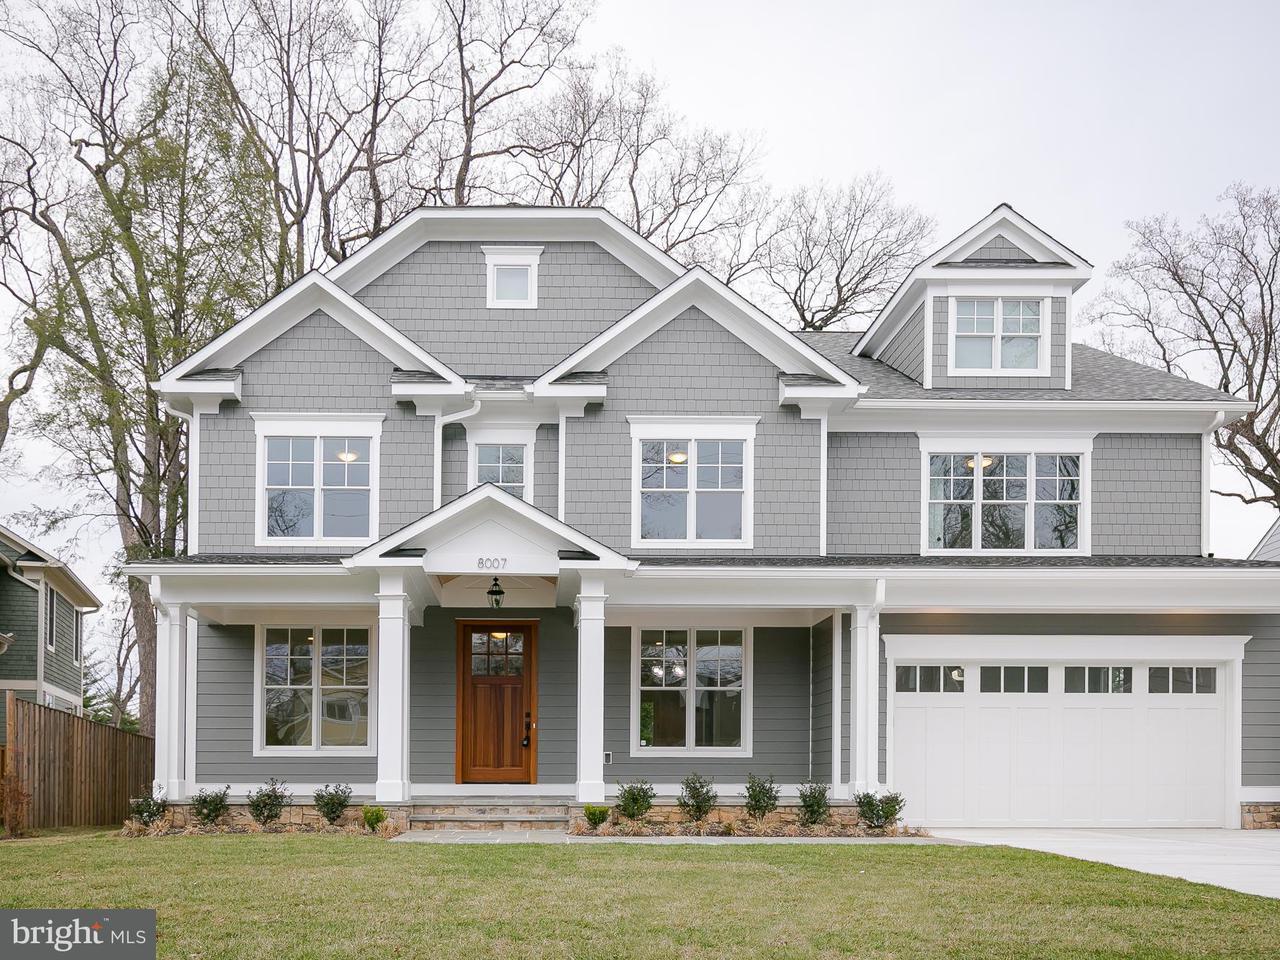 Single Family Home for Sale at 8007 Kentbury Drive 8007 Kentbury Drive Bethesda, Maryland 20814 United States